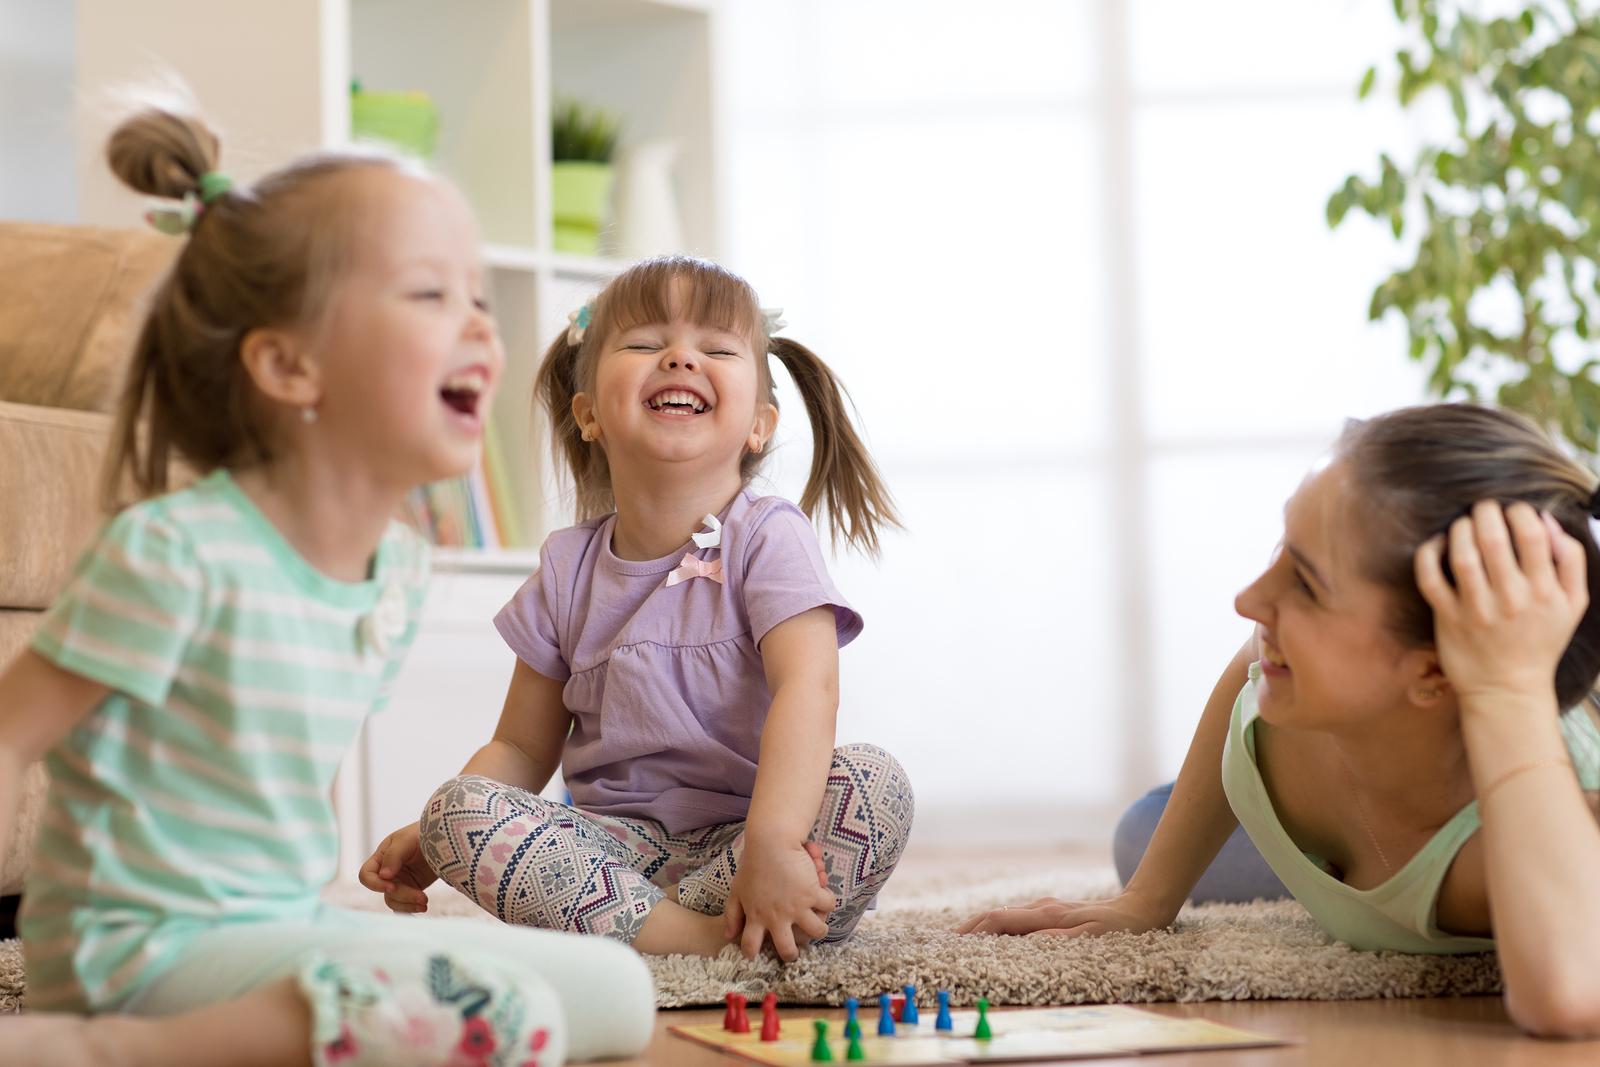 Familie spielt Brettspiele